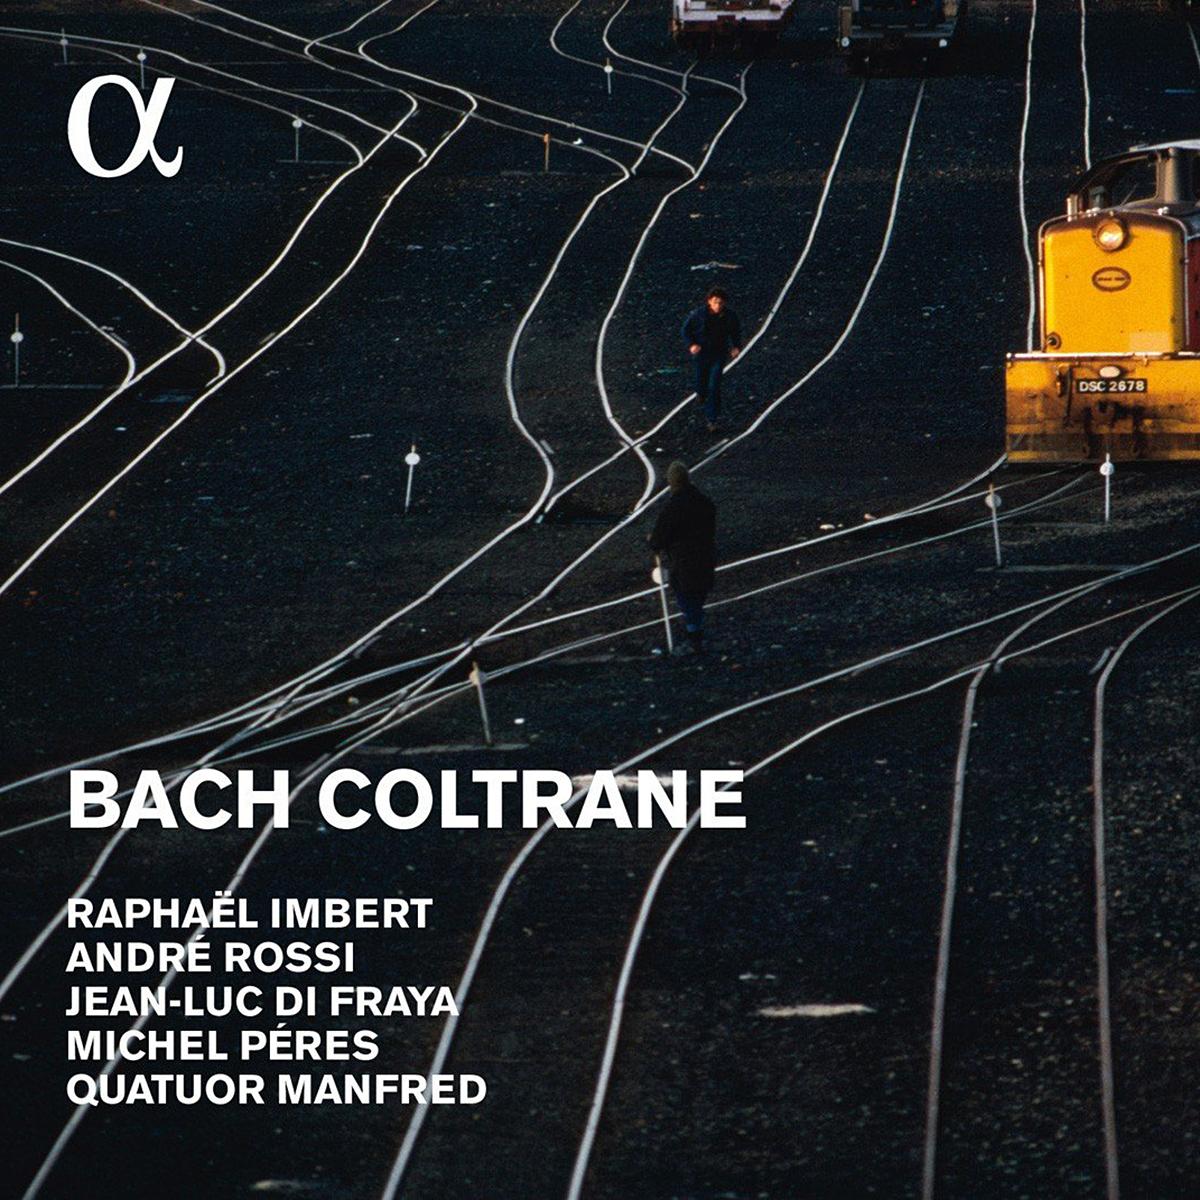 Bach Coltrane de Raphaël Imbert, Jean-Luc Di Fraya, Michel Peres, André Ross et Quatuor Manfred